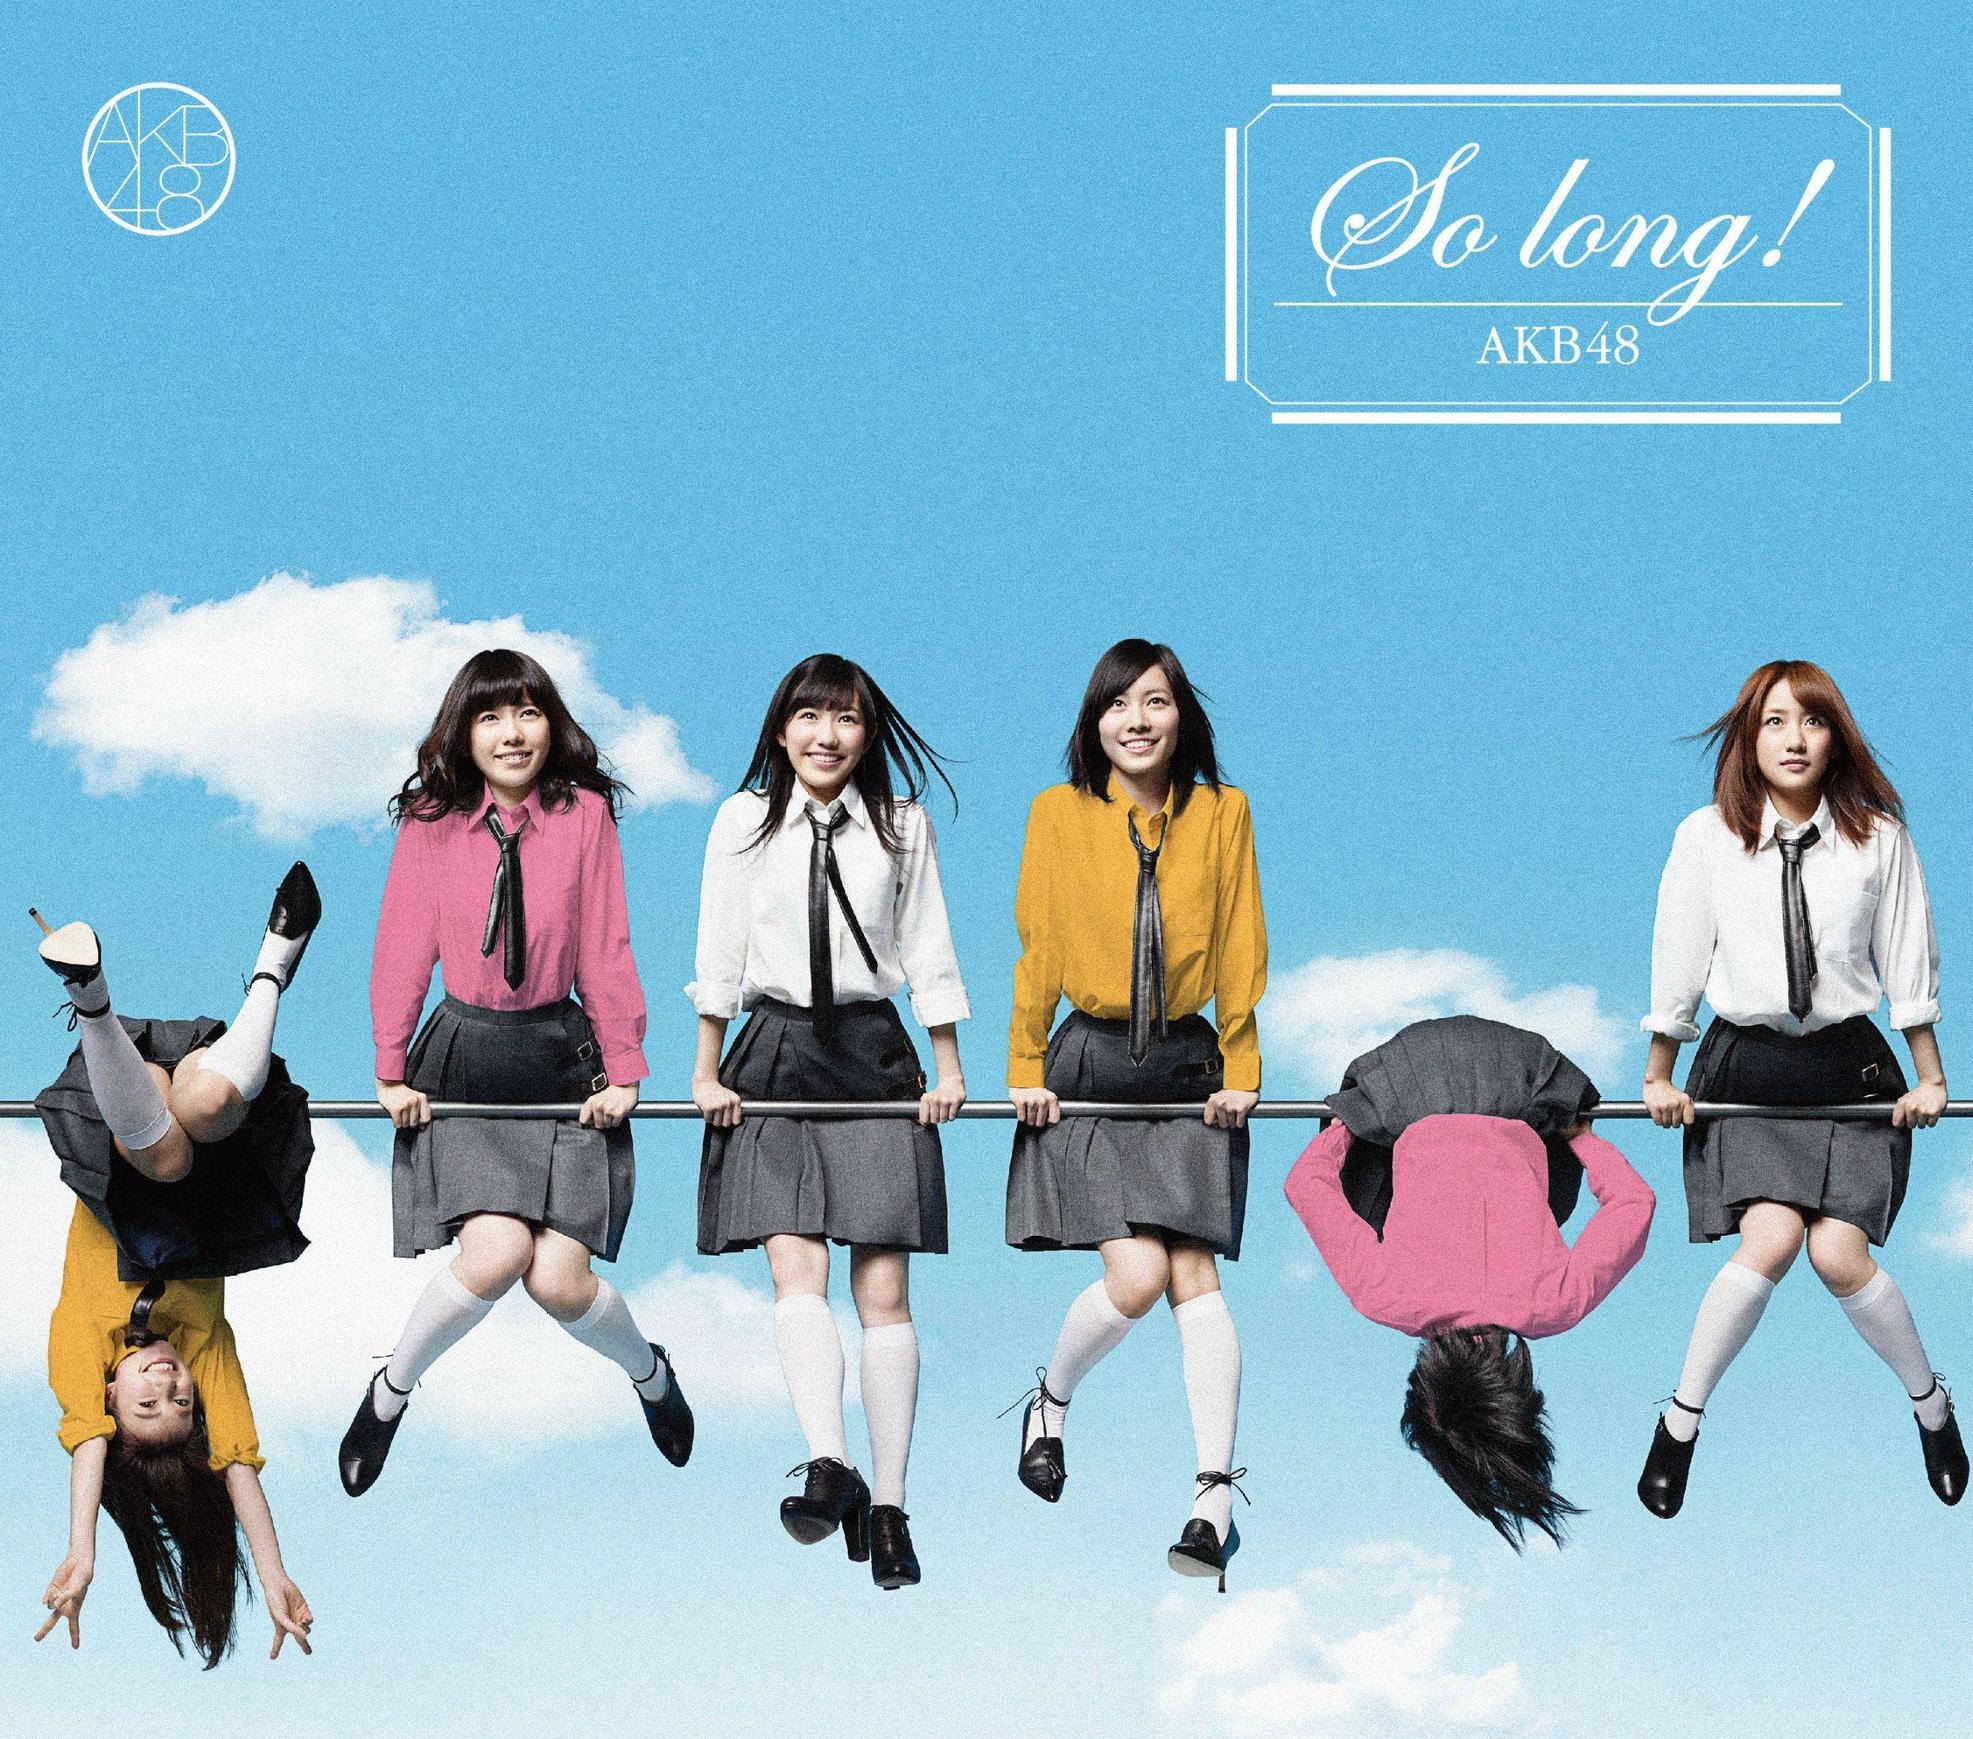 File:akb48 So long typea limited.jpg